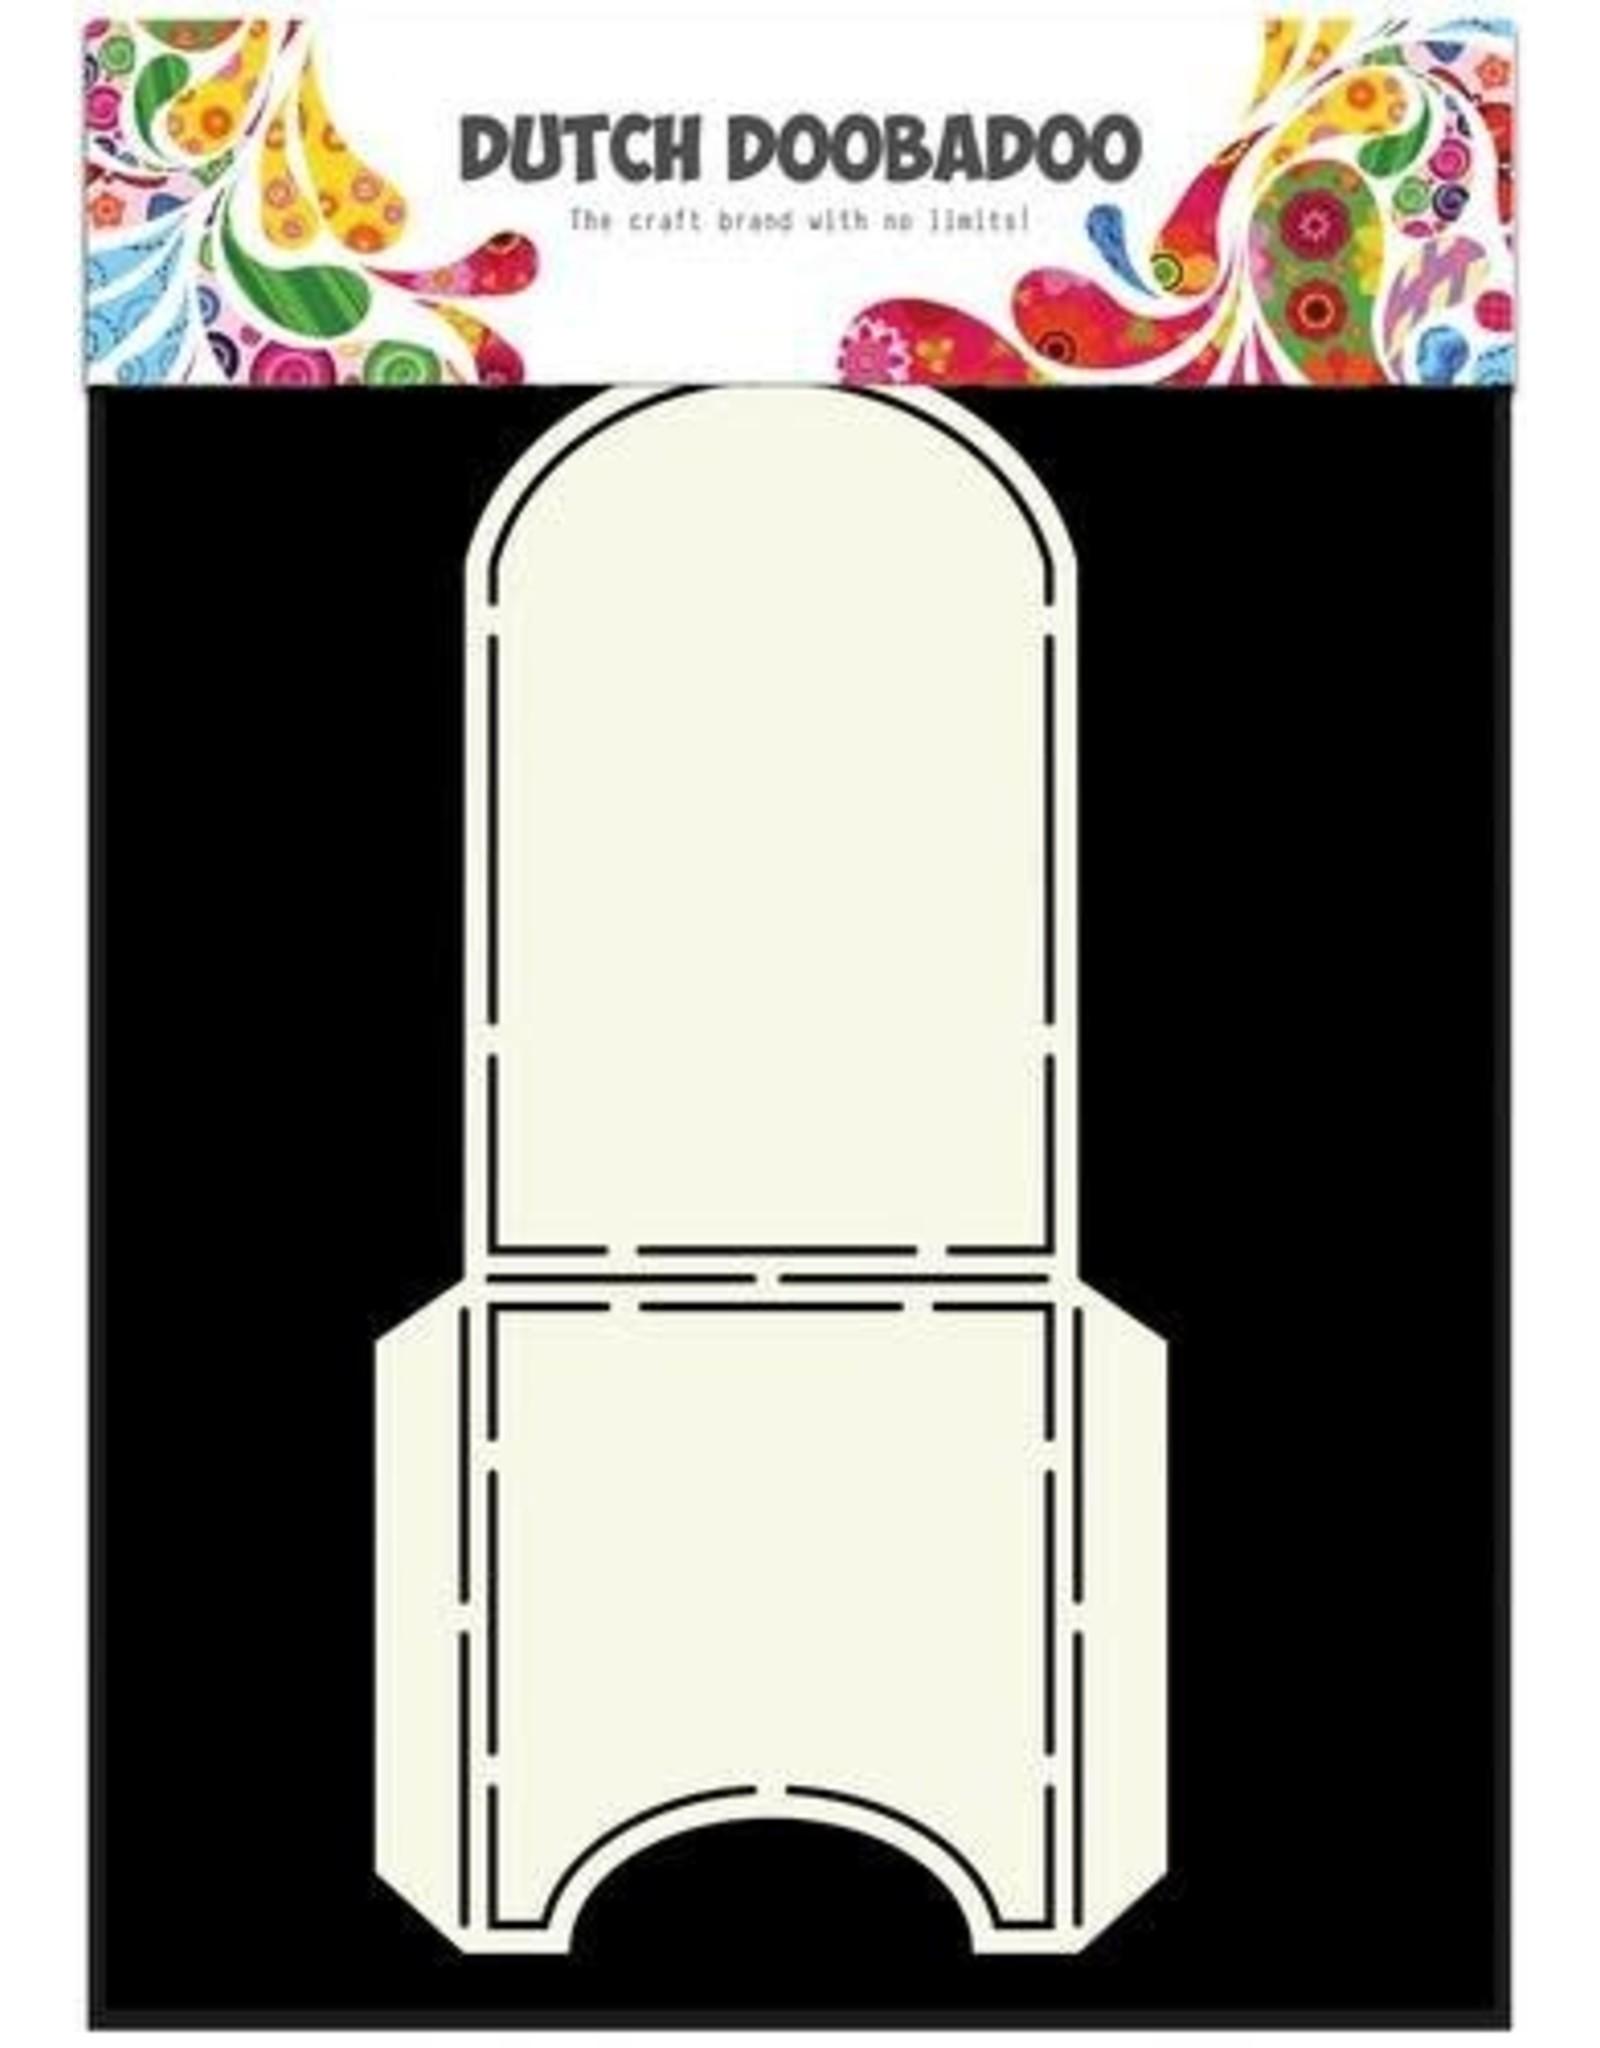 Dutch Doobadoo Box-Art Dutch Doobadoo Dutch Box Art stencil theezak A5 470.713.036